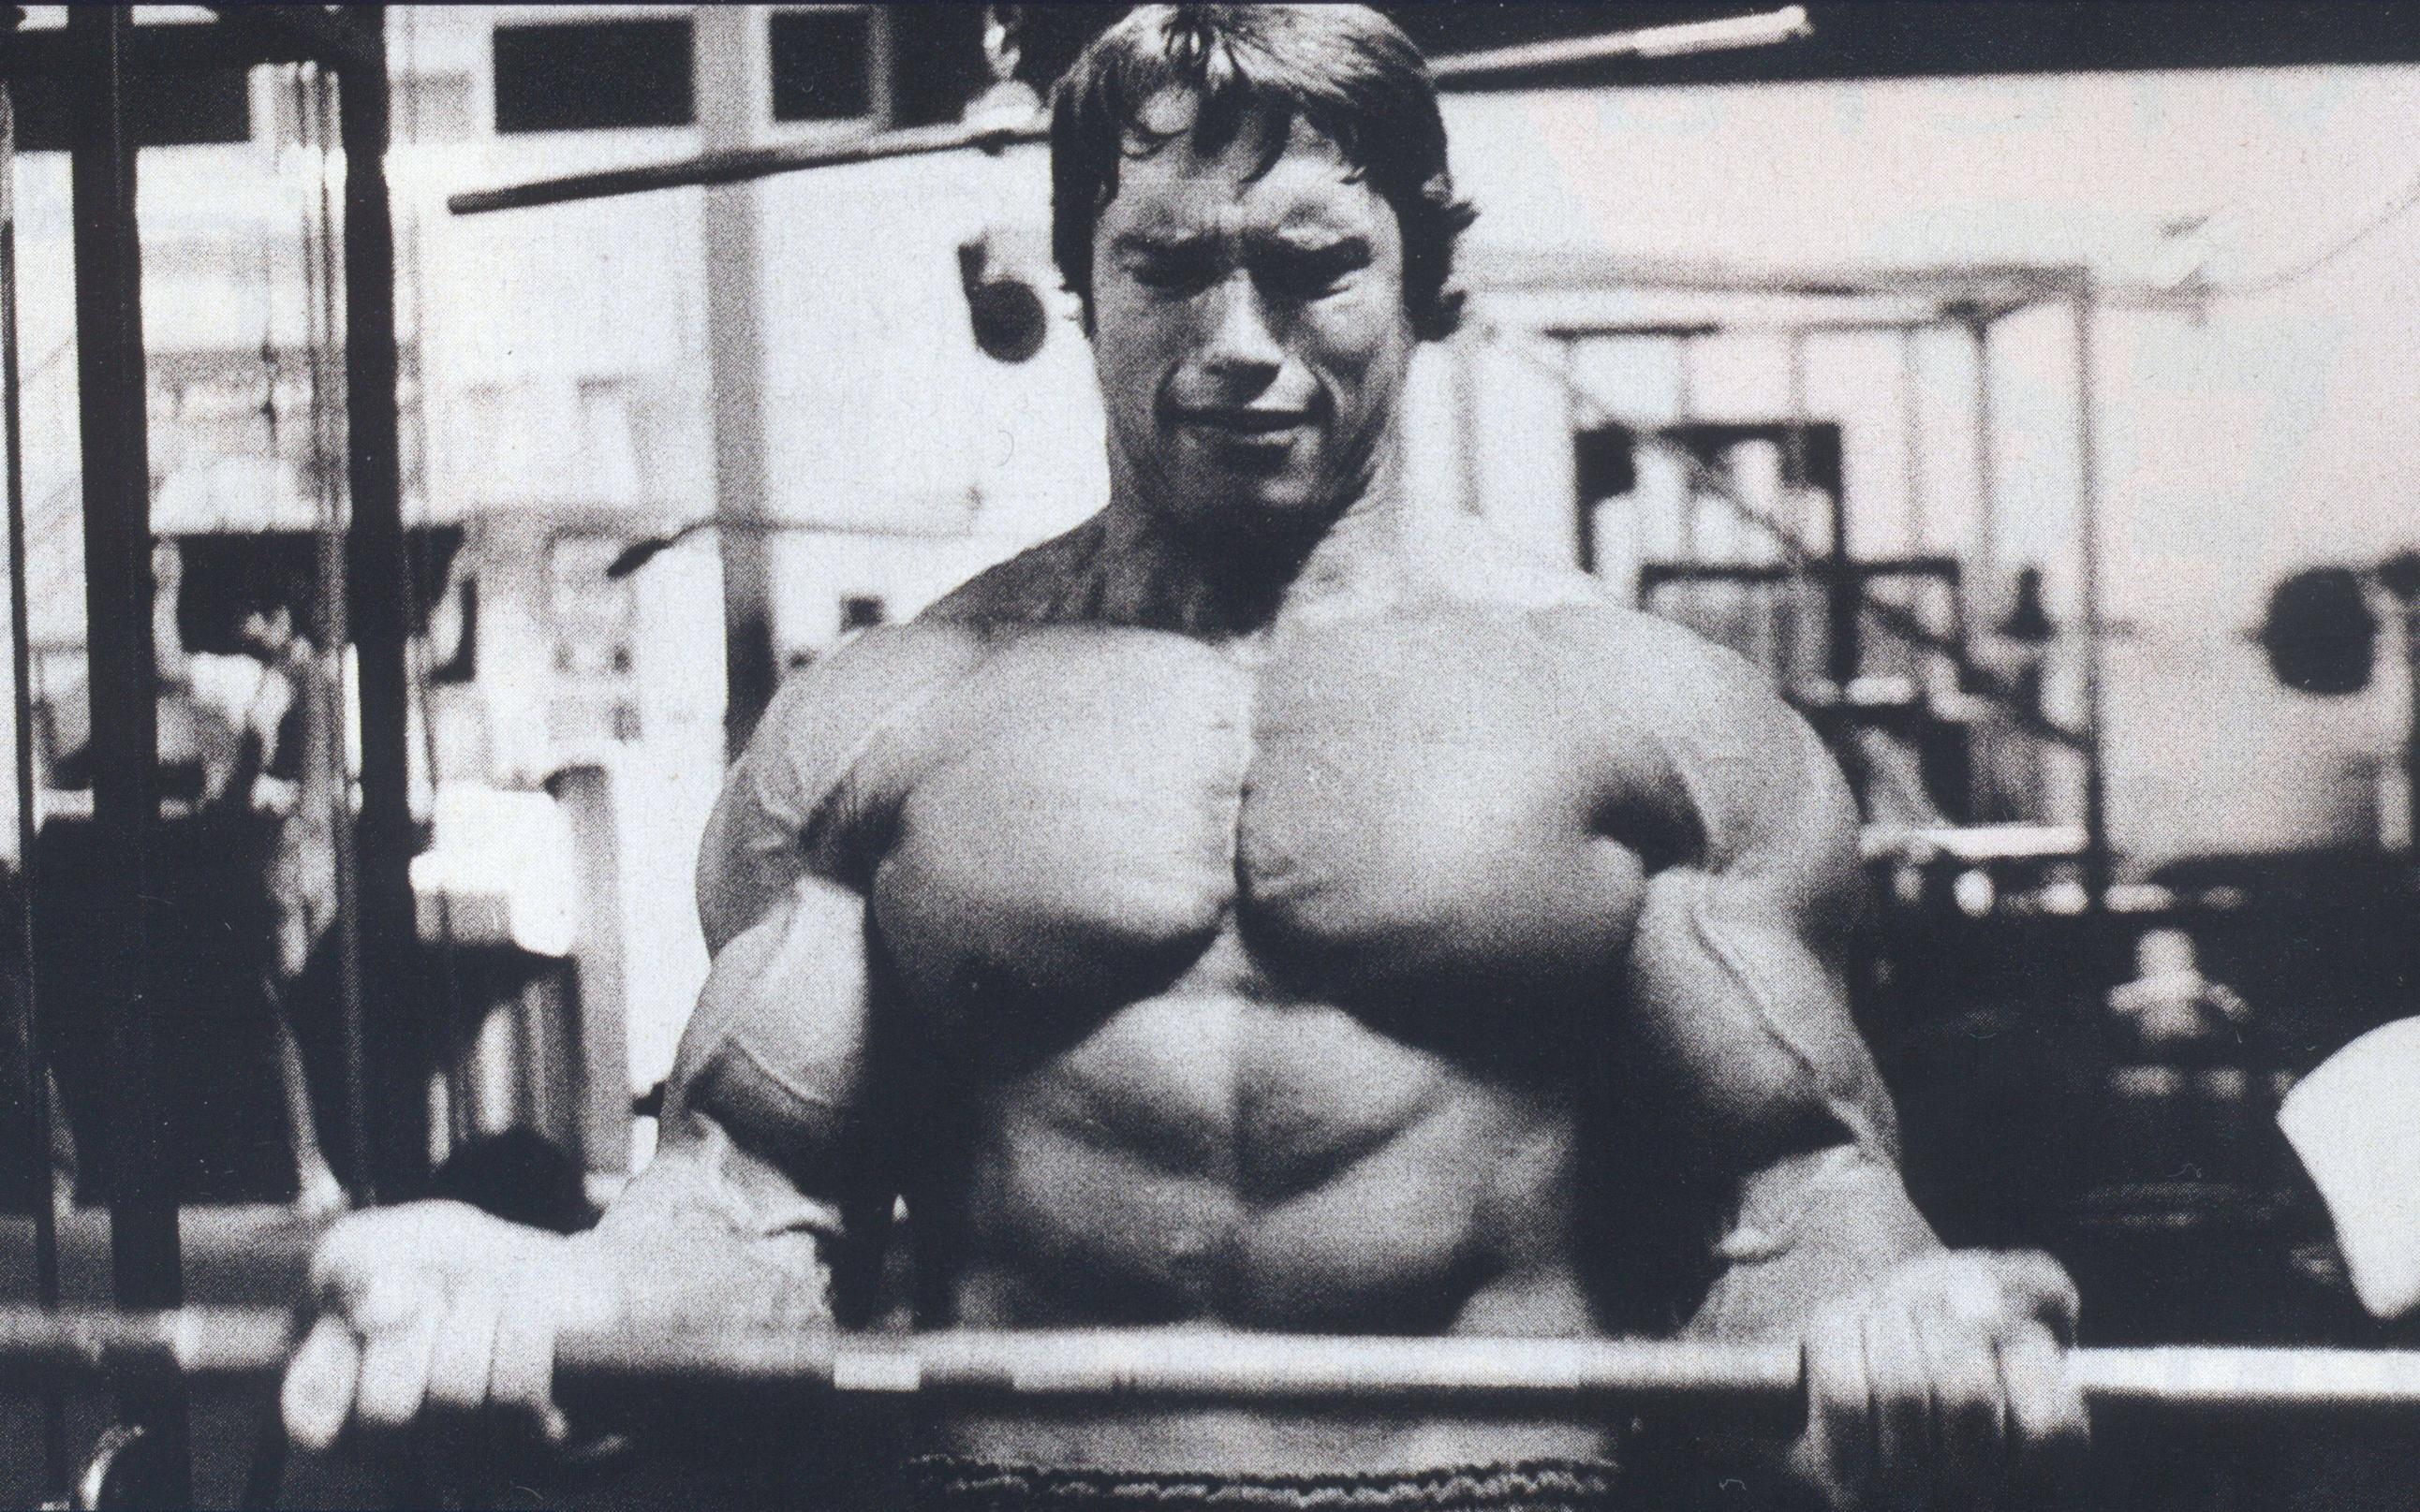 Arnold Wallpaper